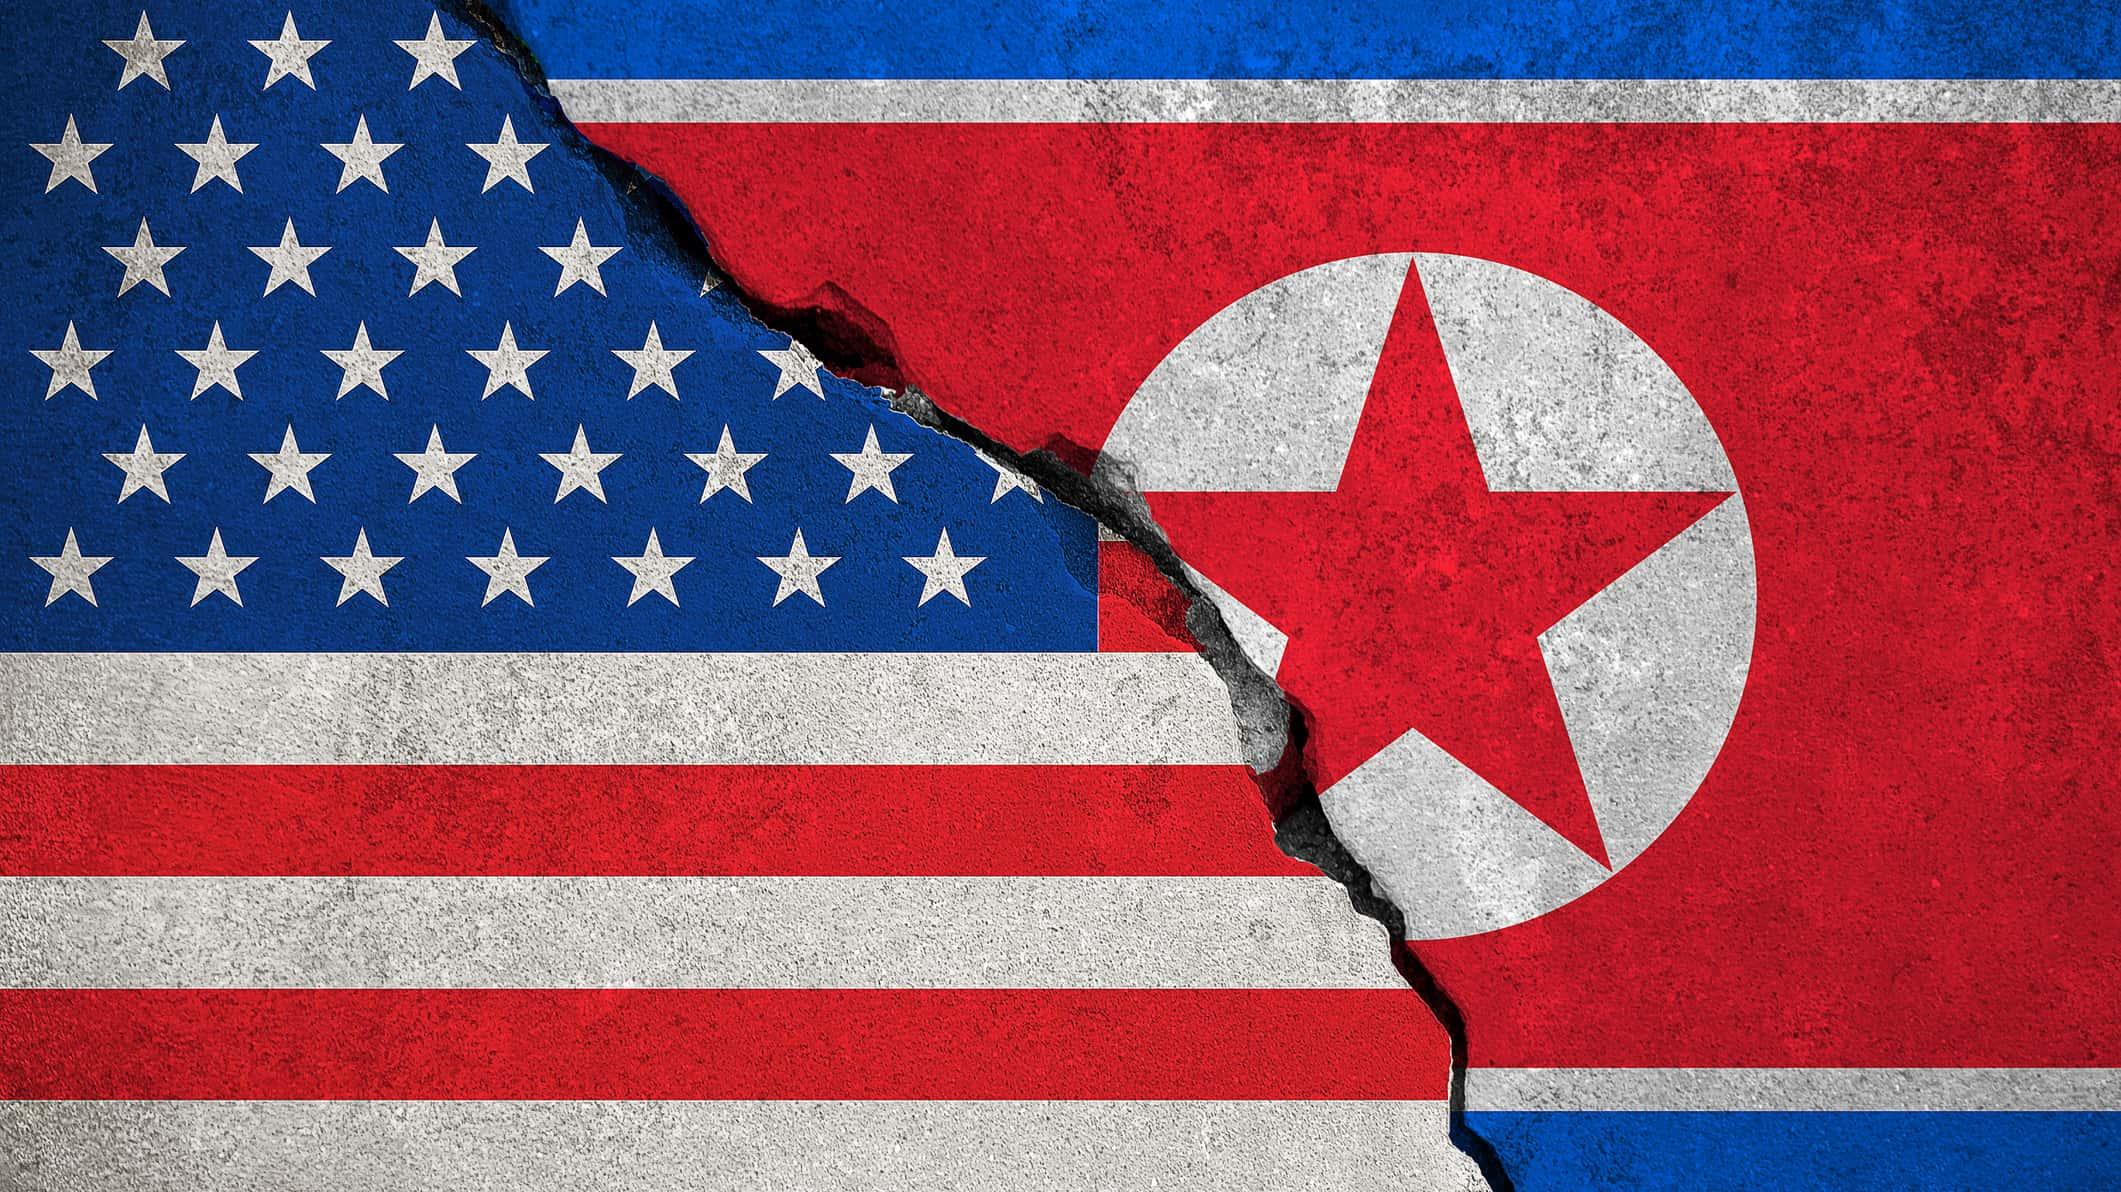 State Dept Dismisses Doubts Ahead Of Pompeo Trip To North Korea Ksro